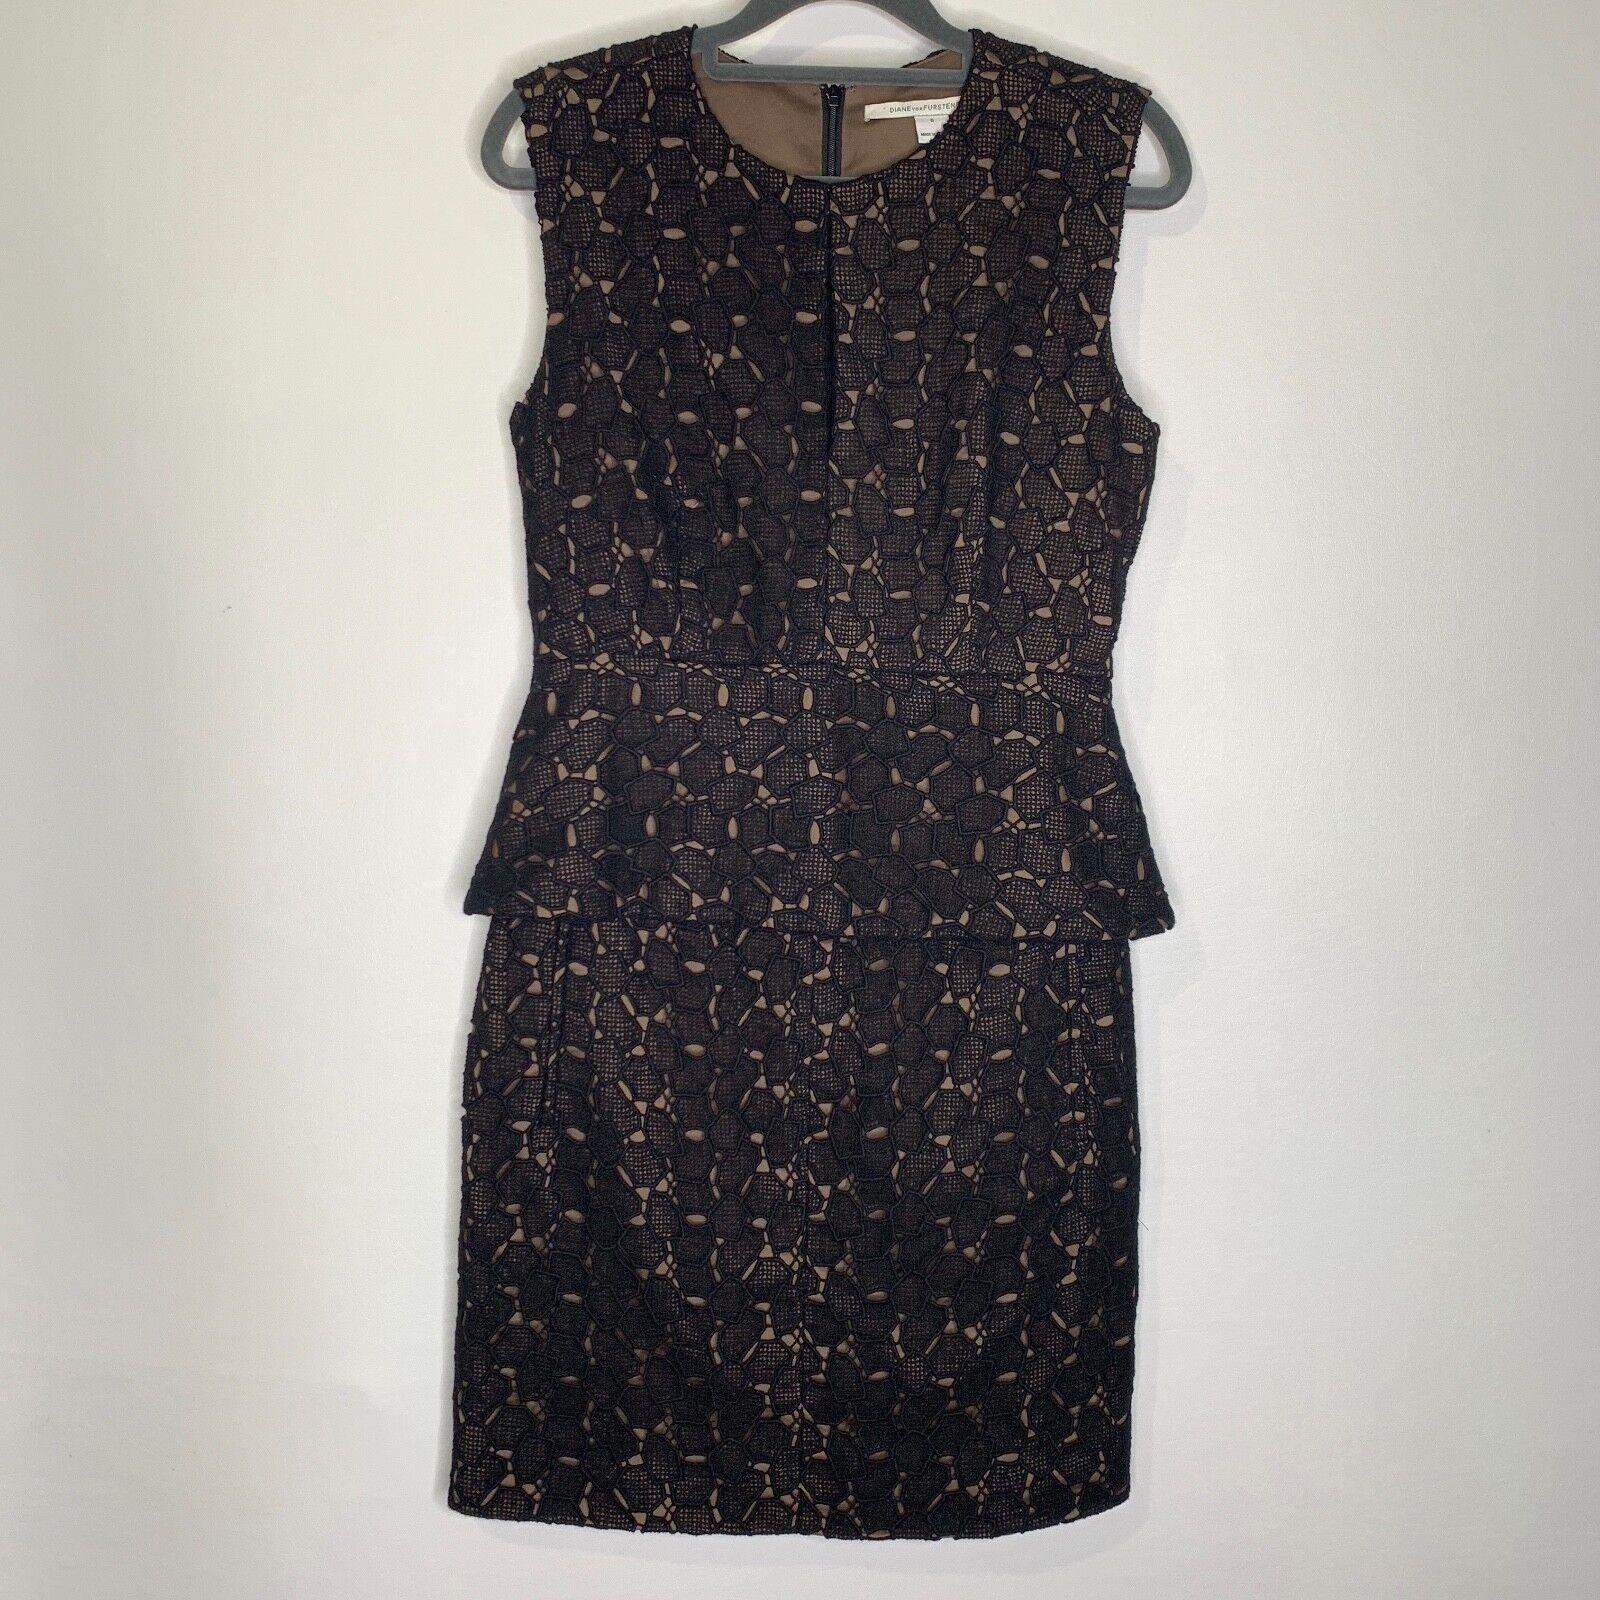 DVF Diane von Furstenberg Delian Pebble Lace Peplum Dress SZ 6